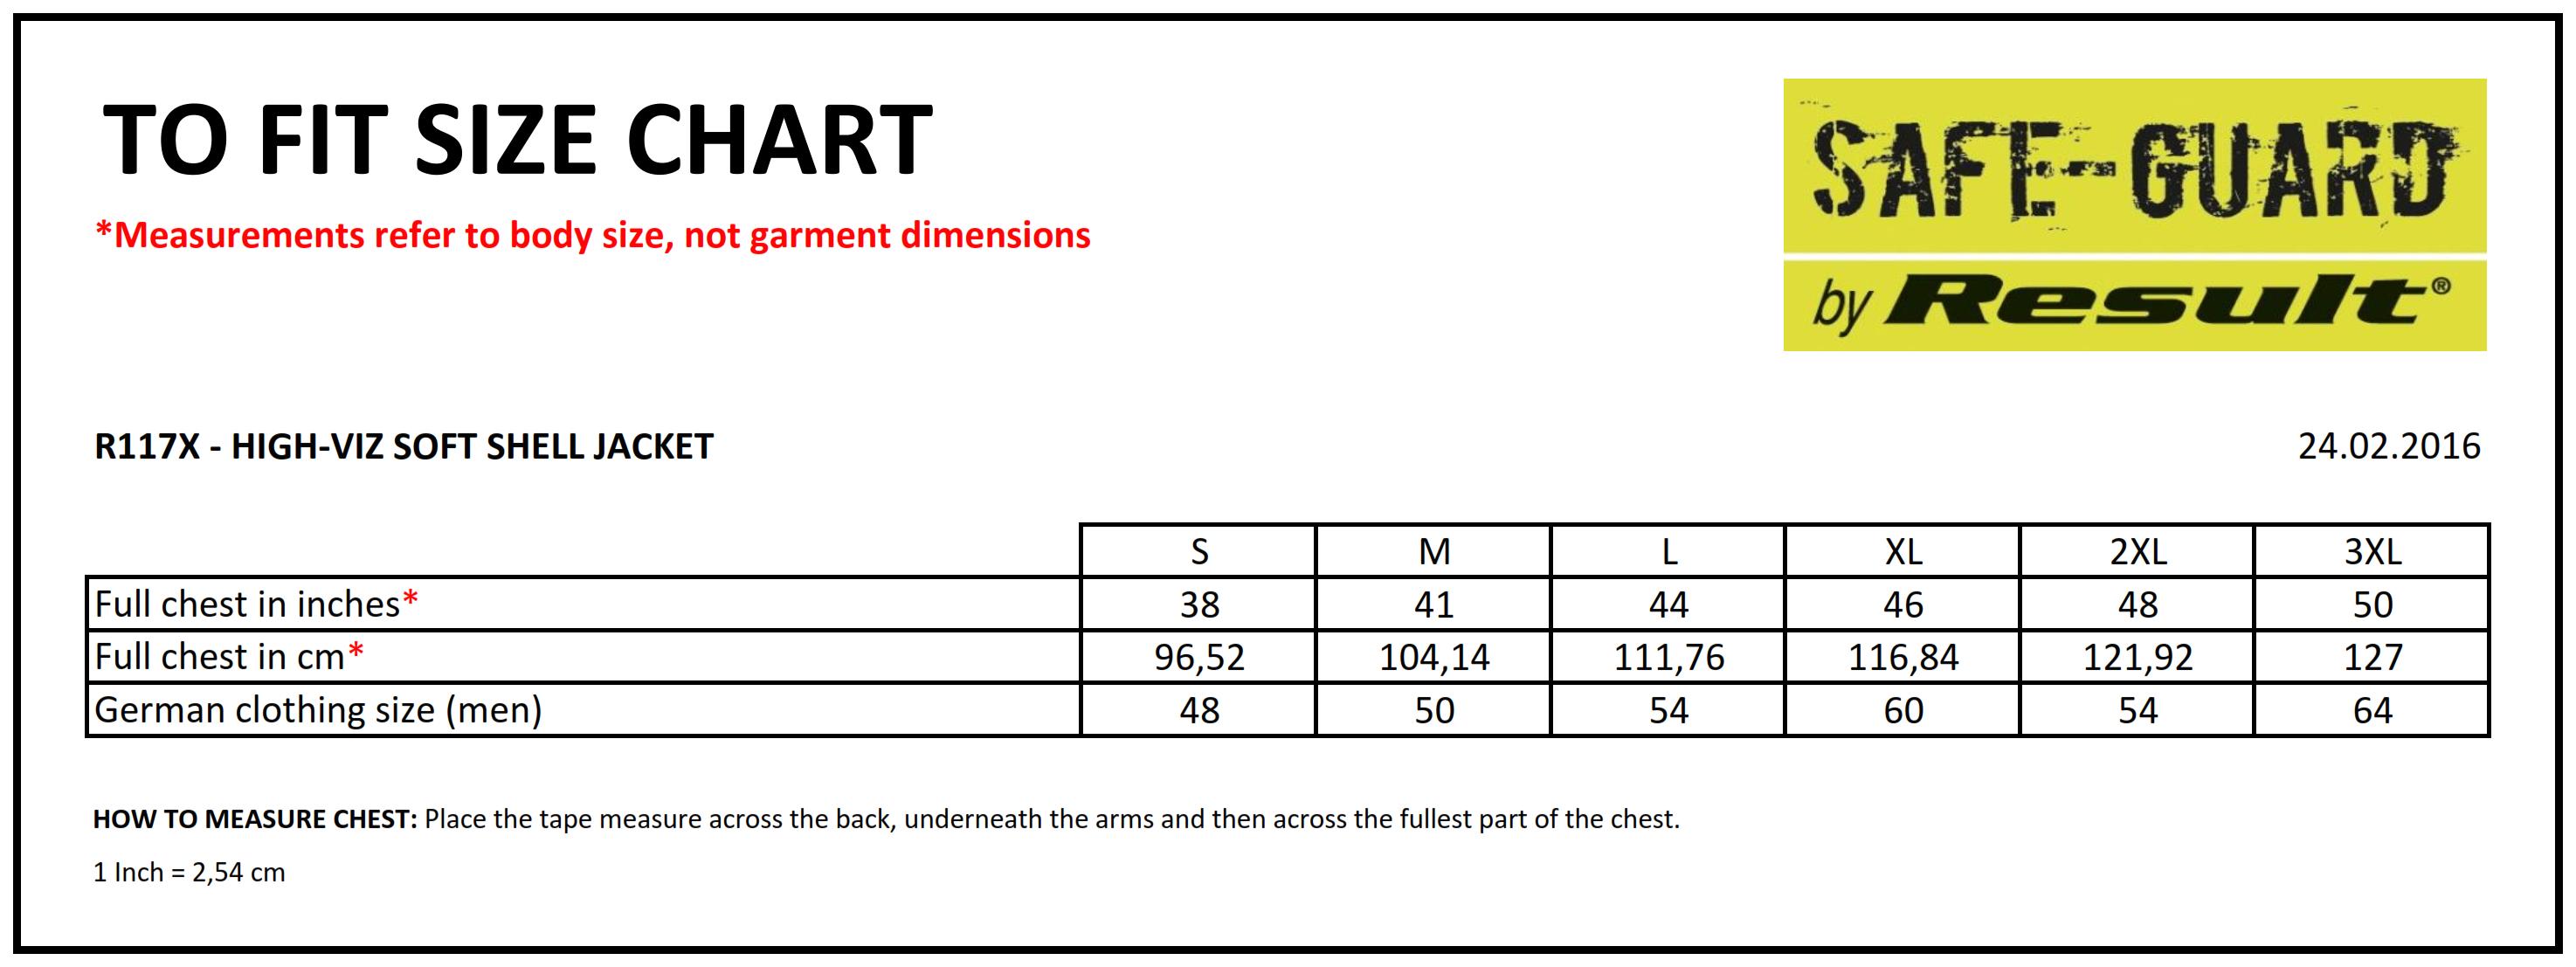 Result: High-Viz Soft Shell Jacket R117